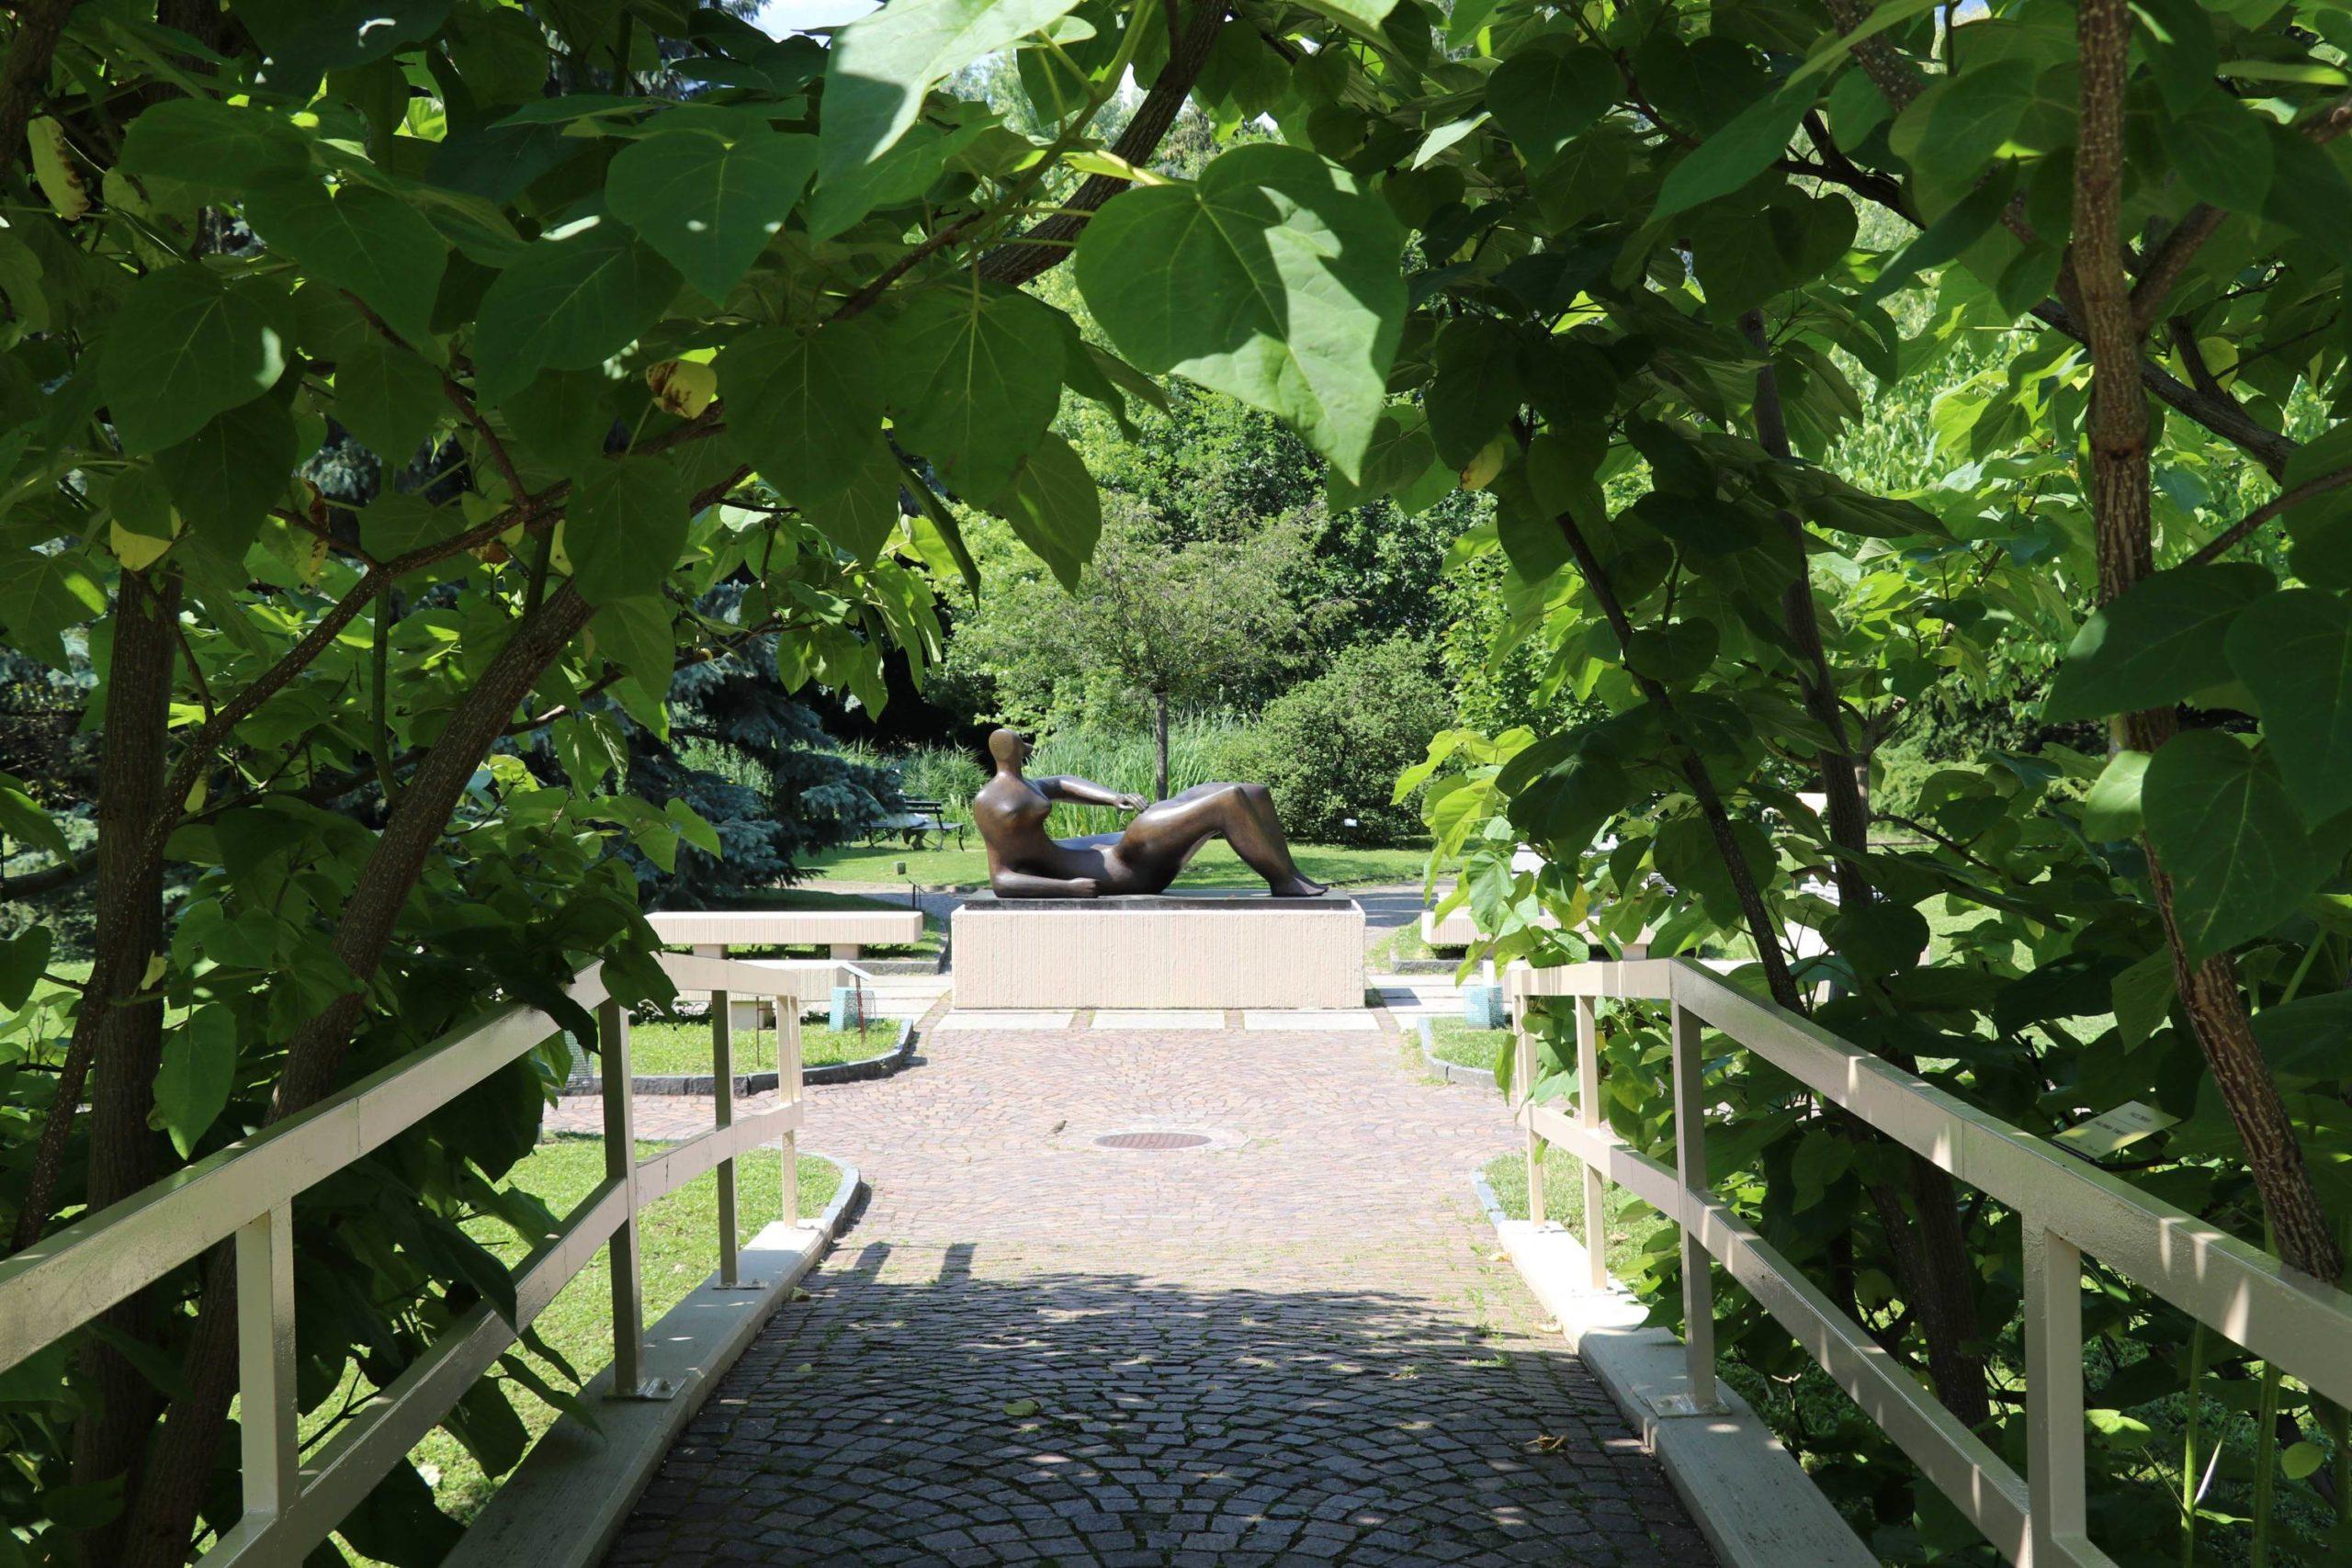 Jardins de la Fondation Pierre Gianadda